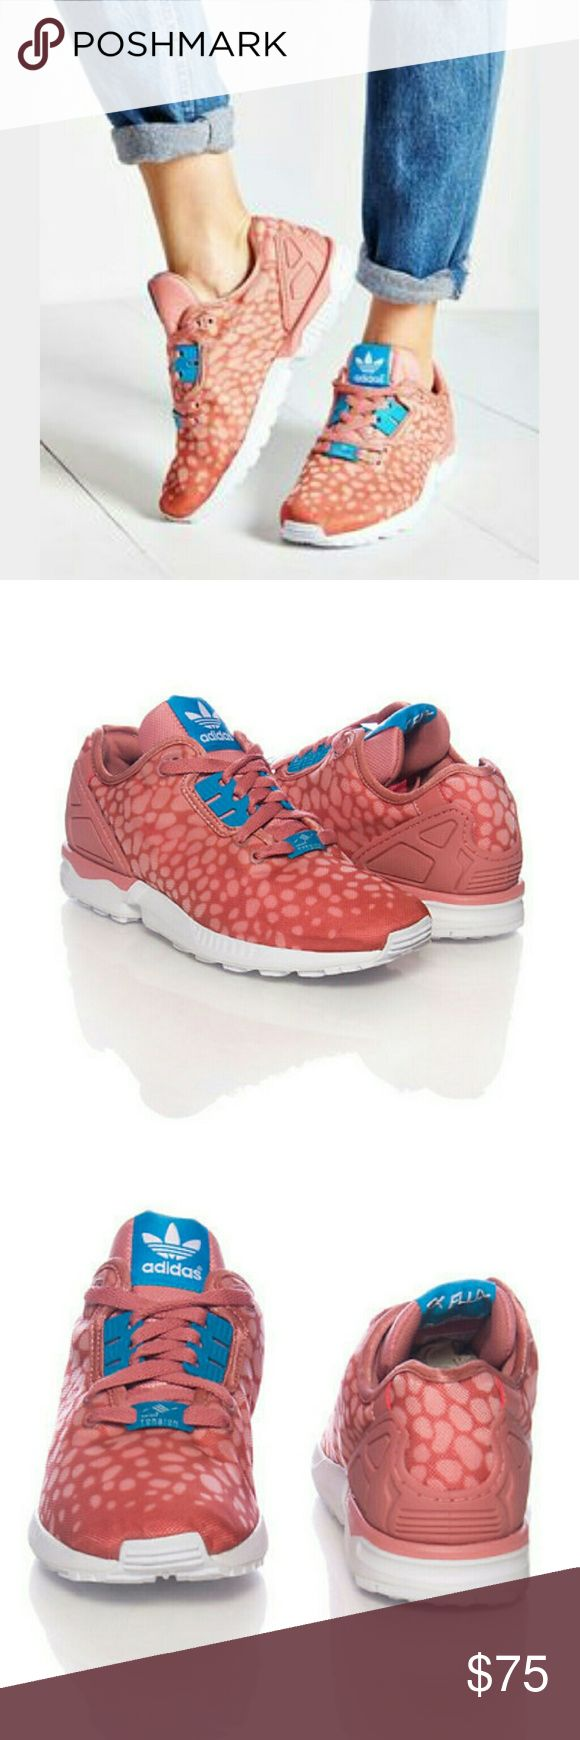 Adidas ZX Flux Decon Sneakers Brand NIB Adidas ZX Flux Decon Sneakers Adidas Shoes Sneakers